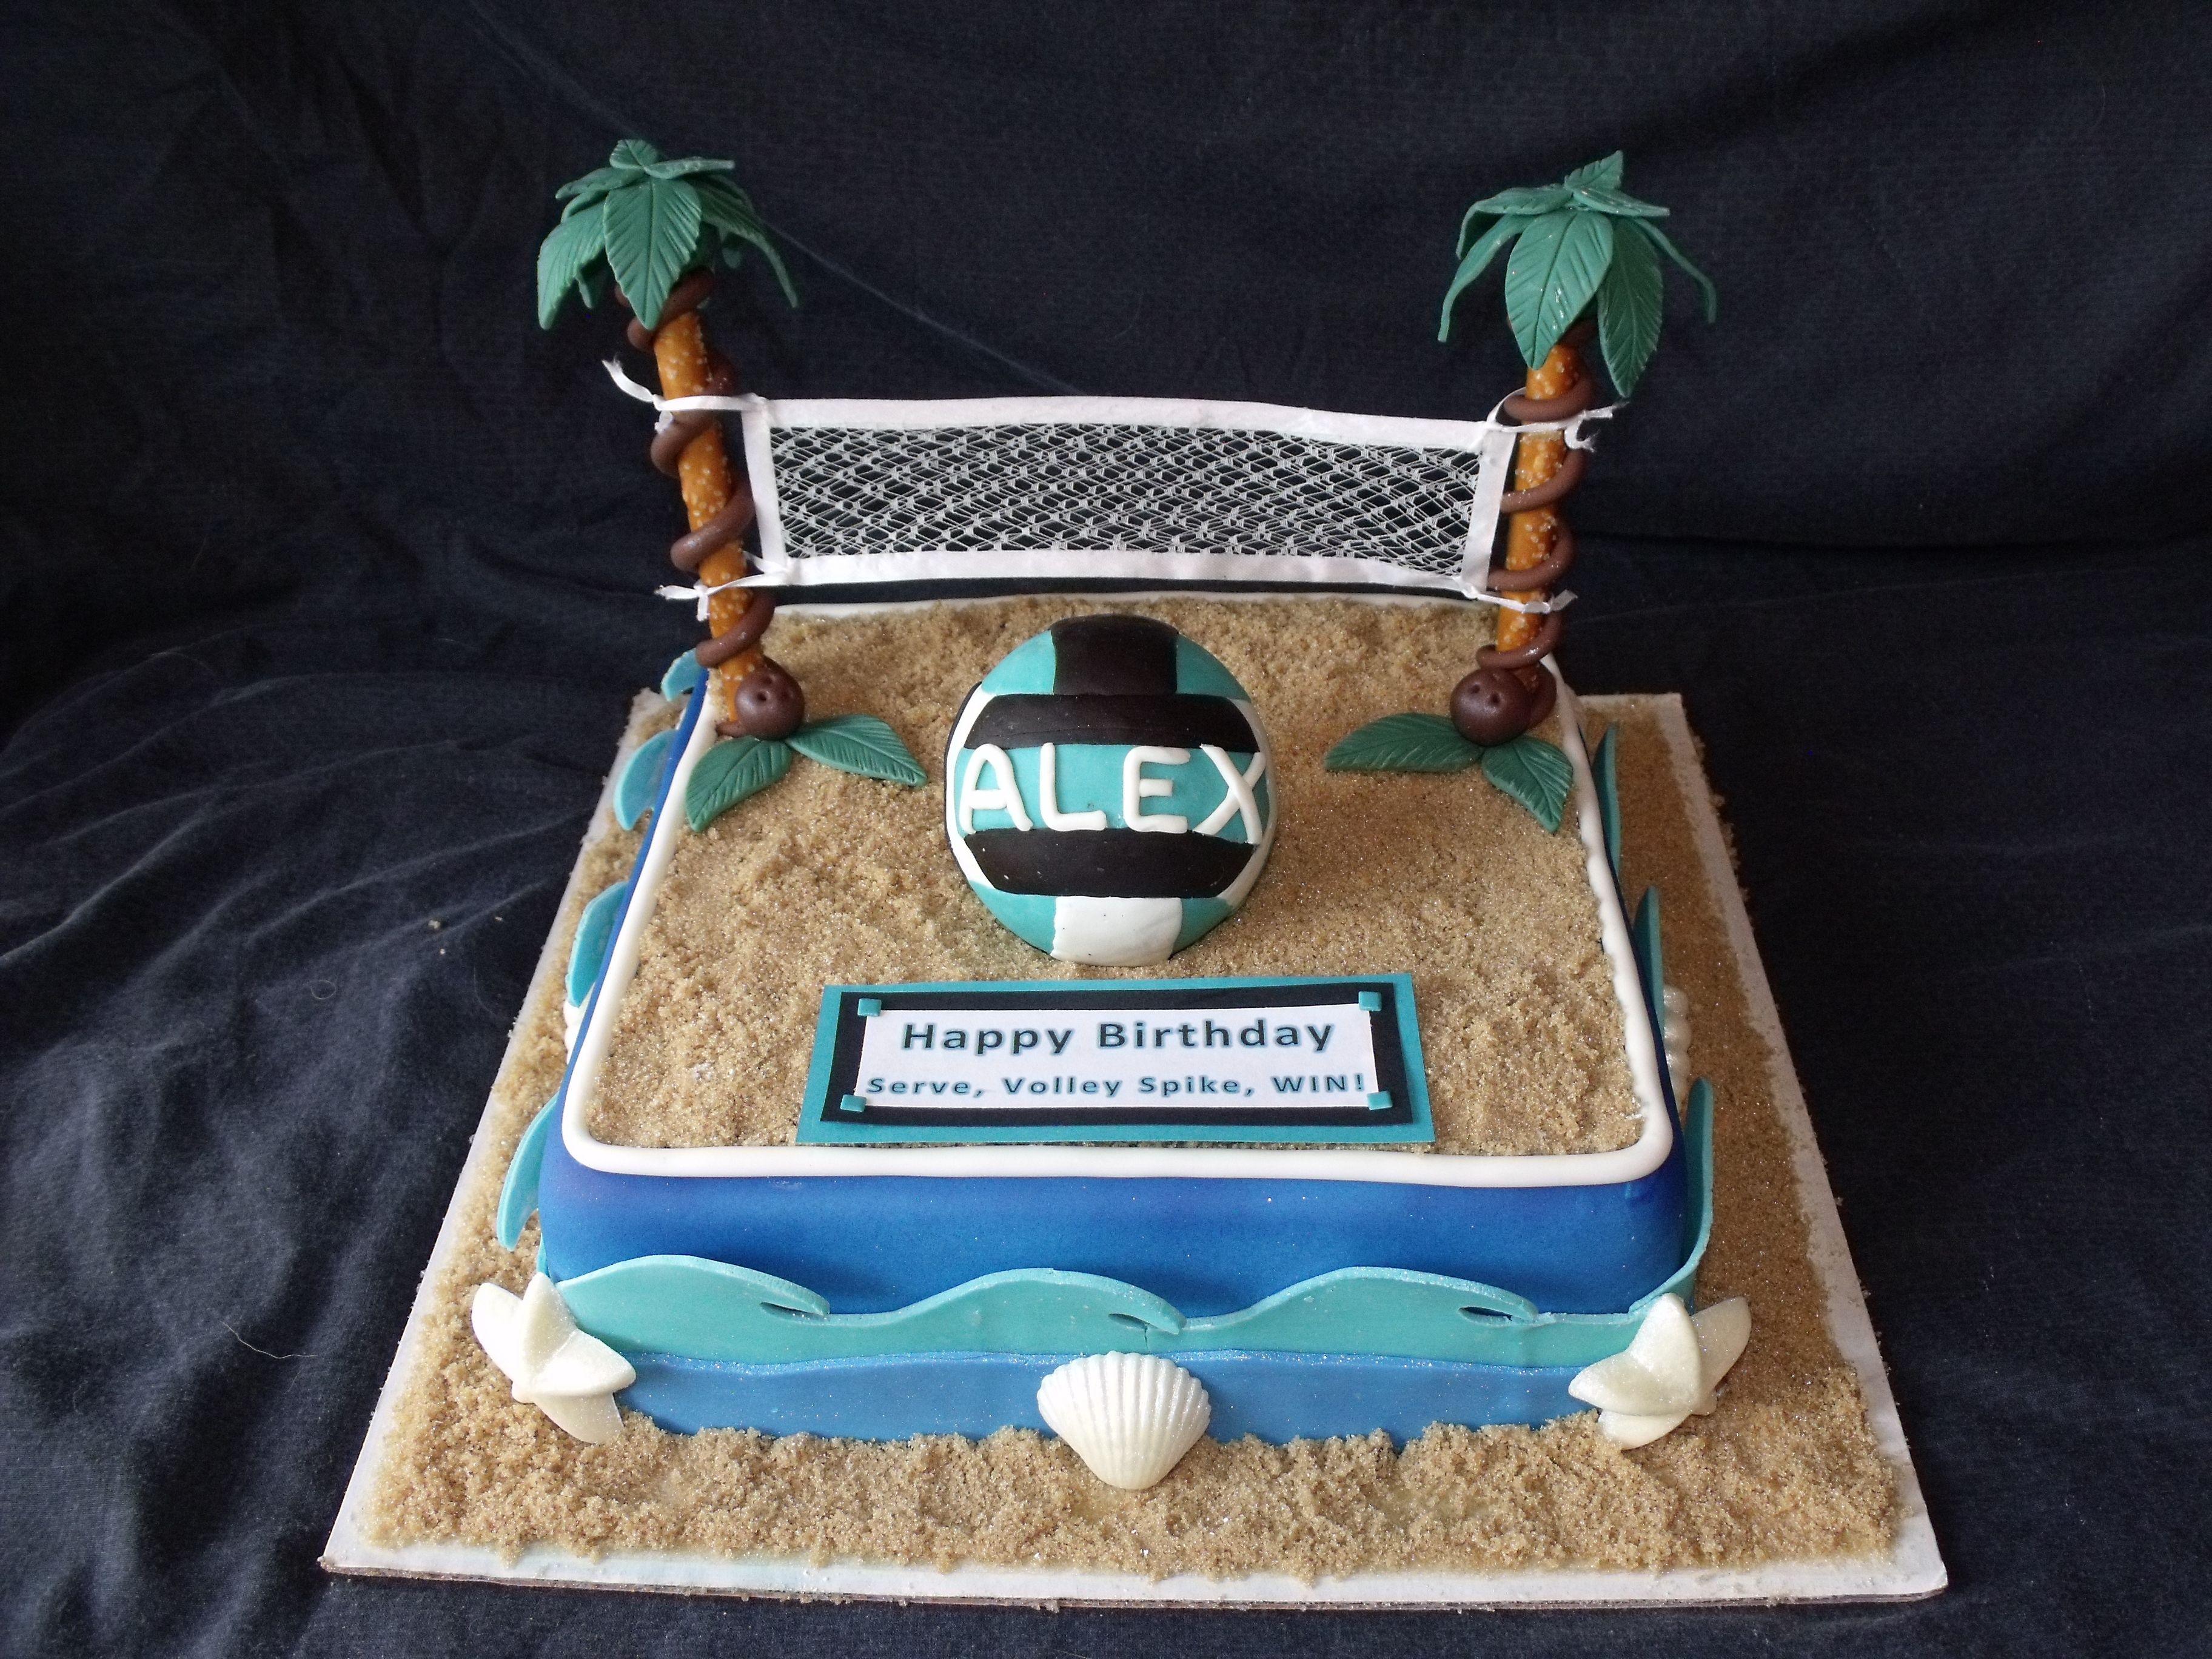 Beach Volleyball Children S Birthday Cakes Volleyball Cakes Volleyball Birthday Cakes Volleyball Birthday Party